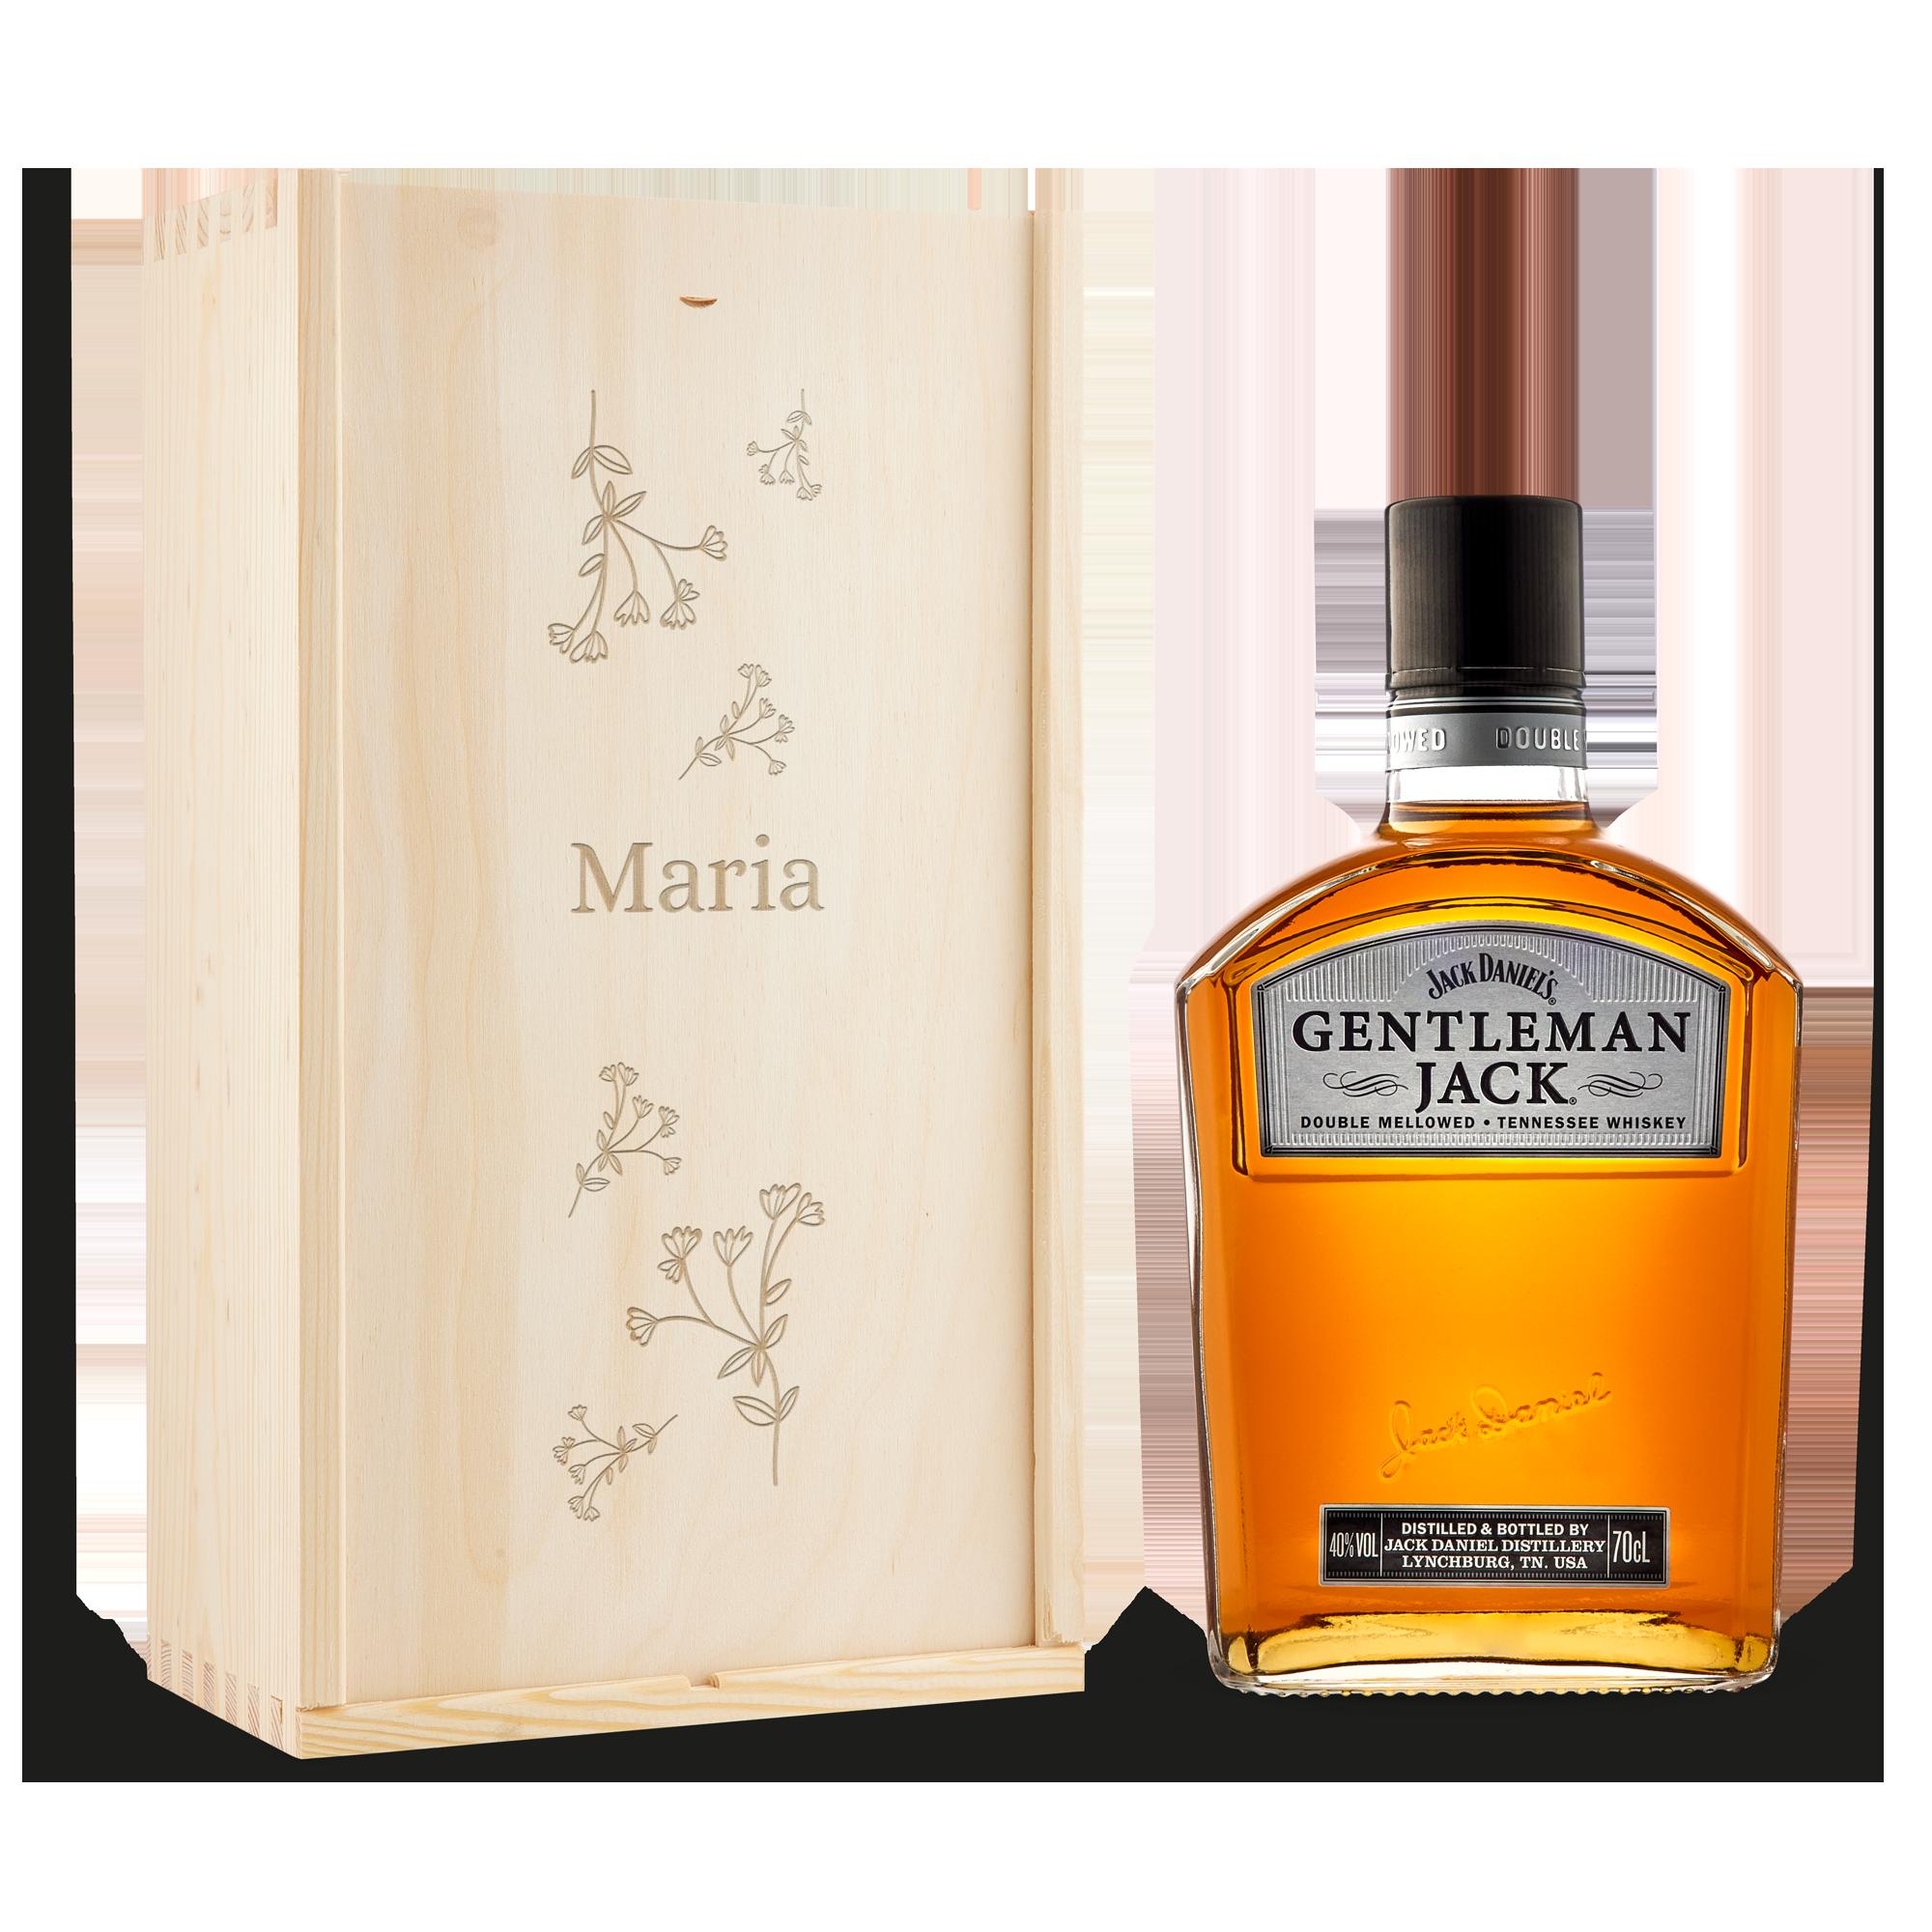 Individuellleckereien - Jack Daniels Gentleman Jack in gravierter Kiste - Onlineshop YourSurprise